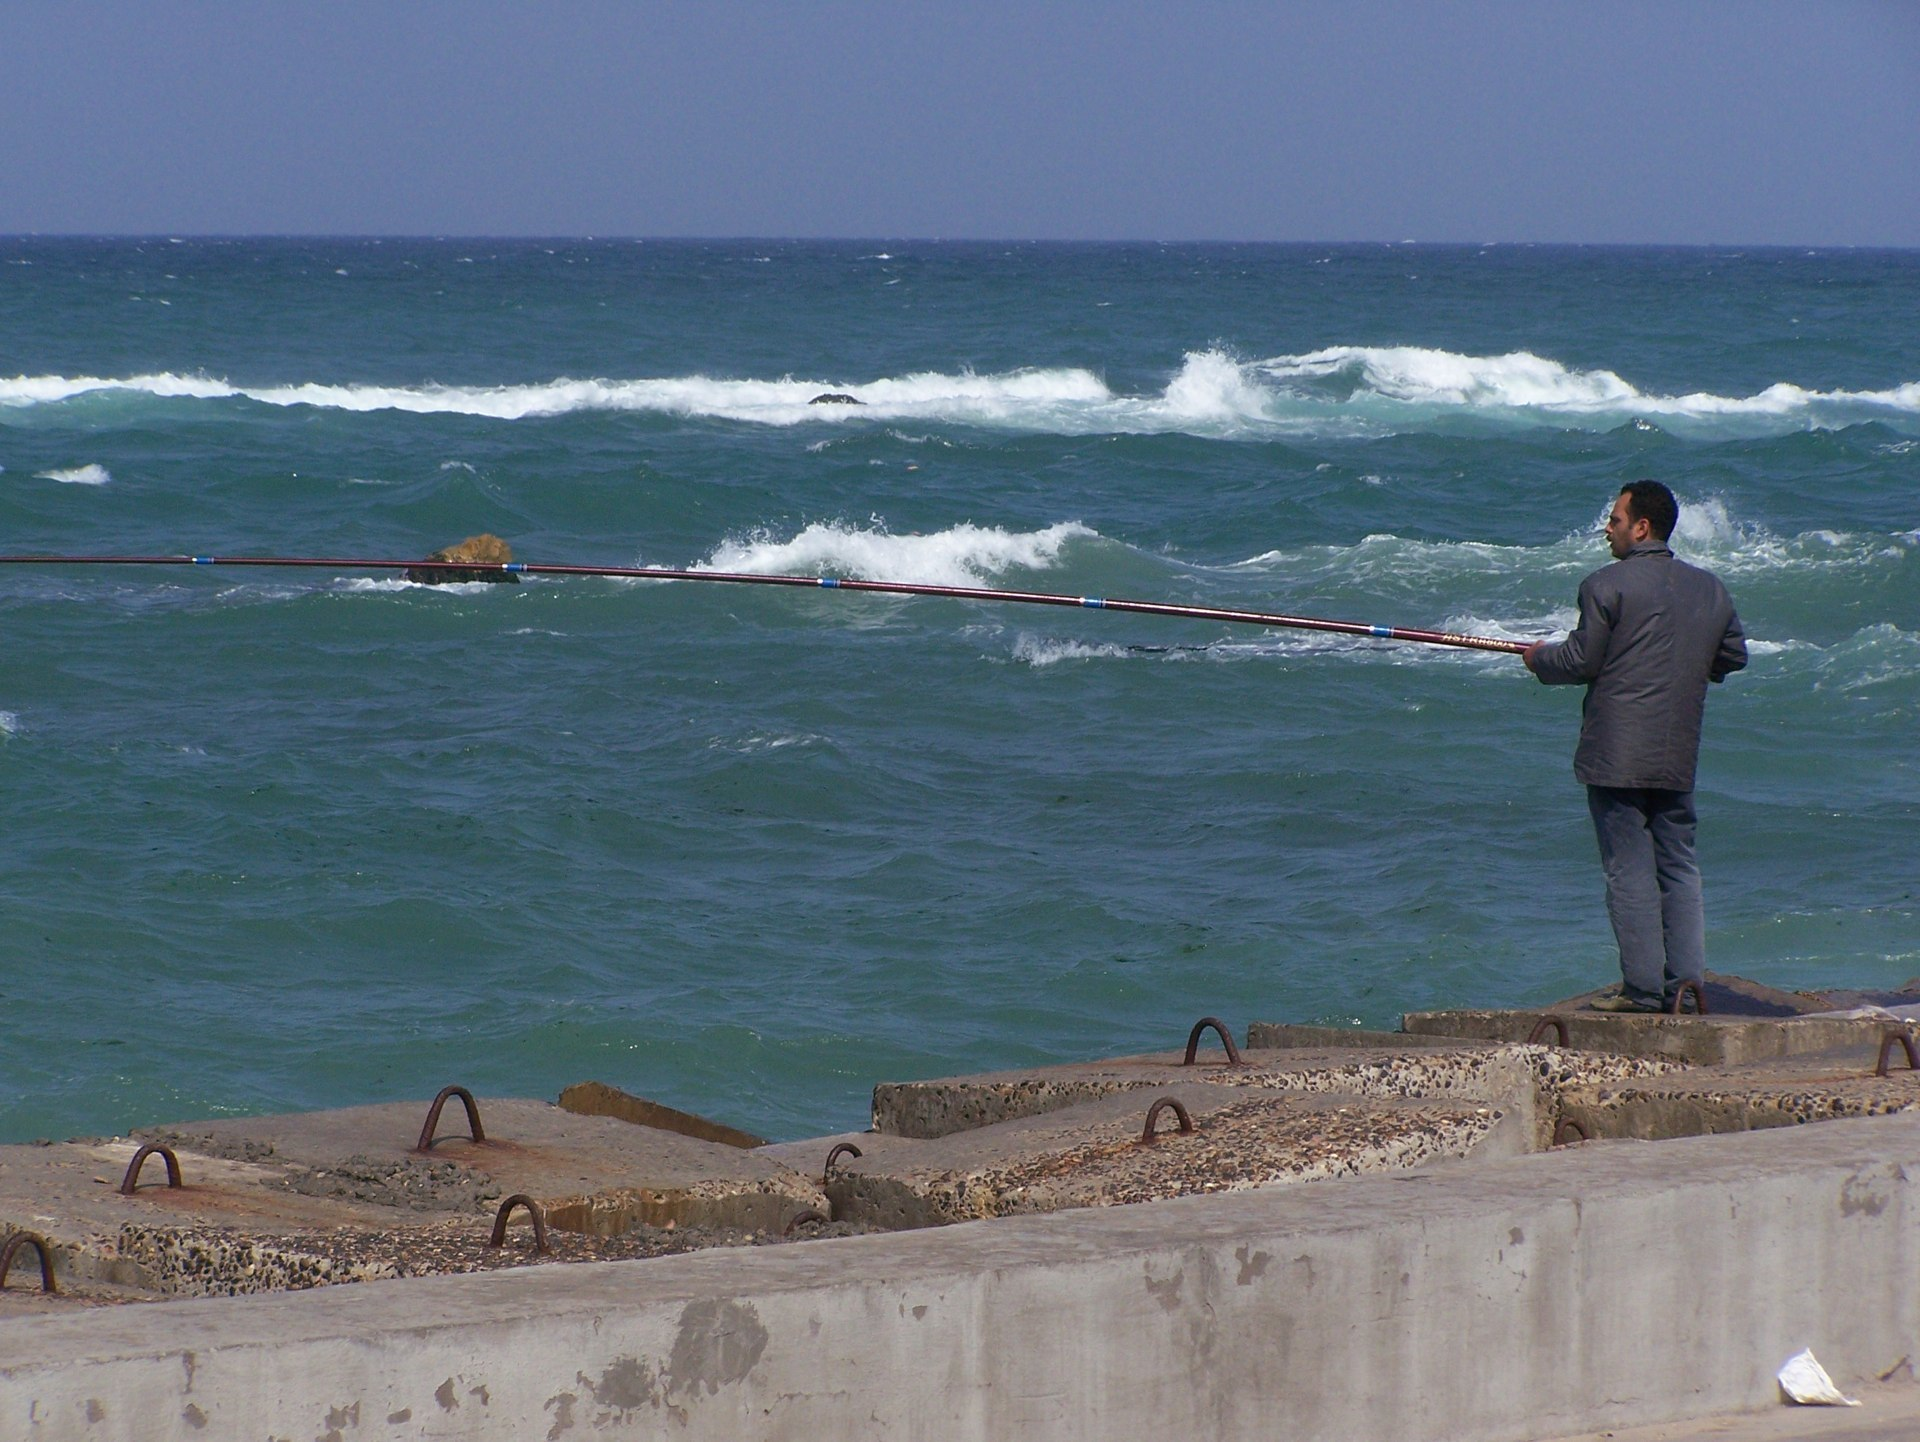 Angler am Meer, Alexandria